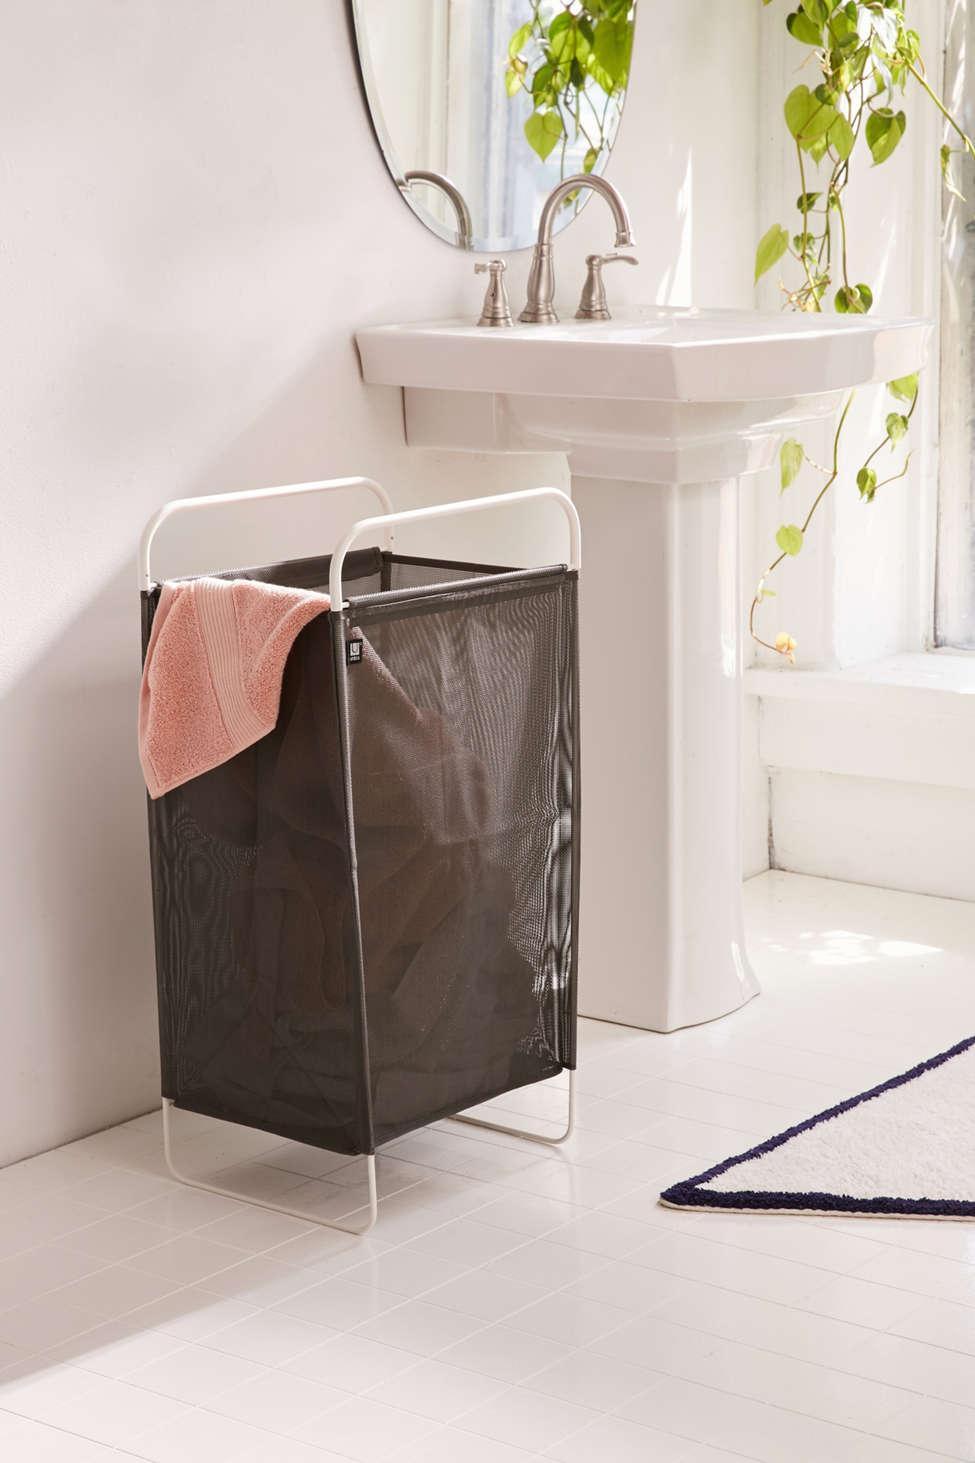 Slide View: 1: Cinch Laundry Hamper